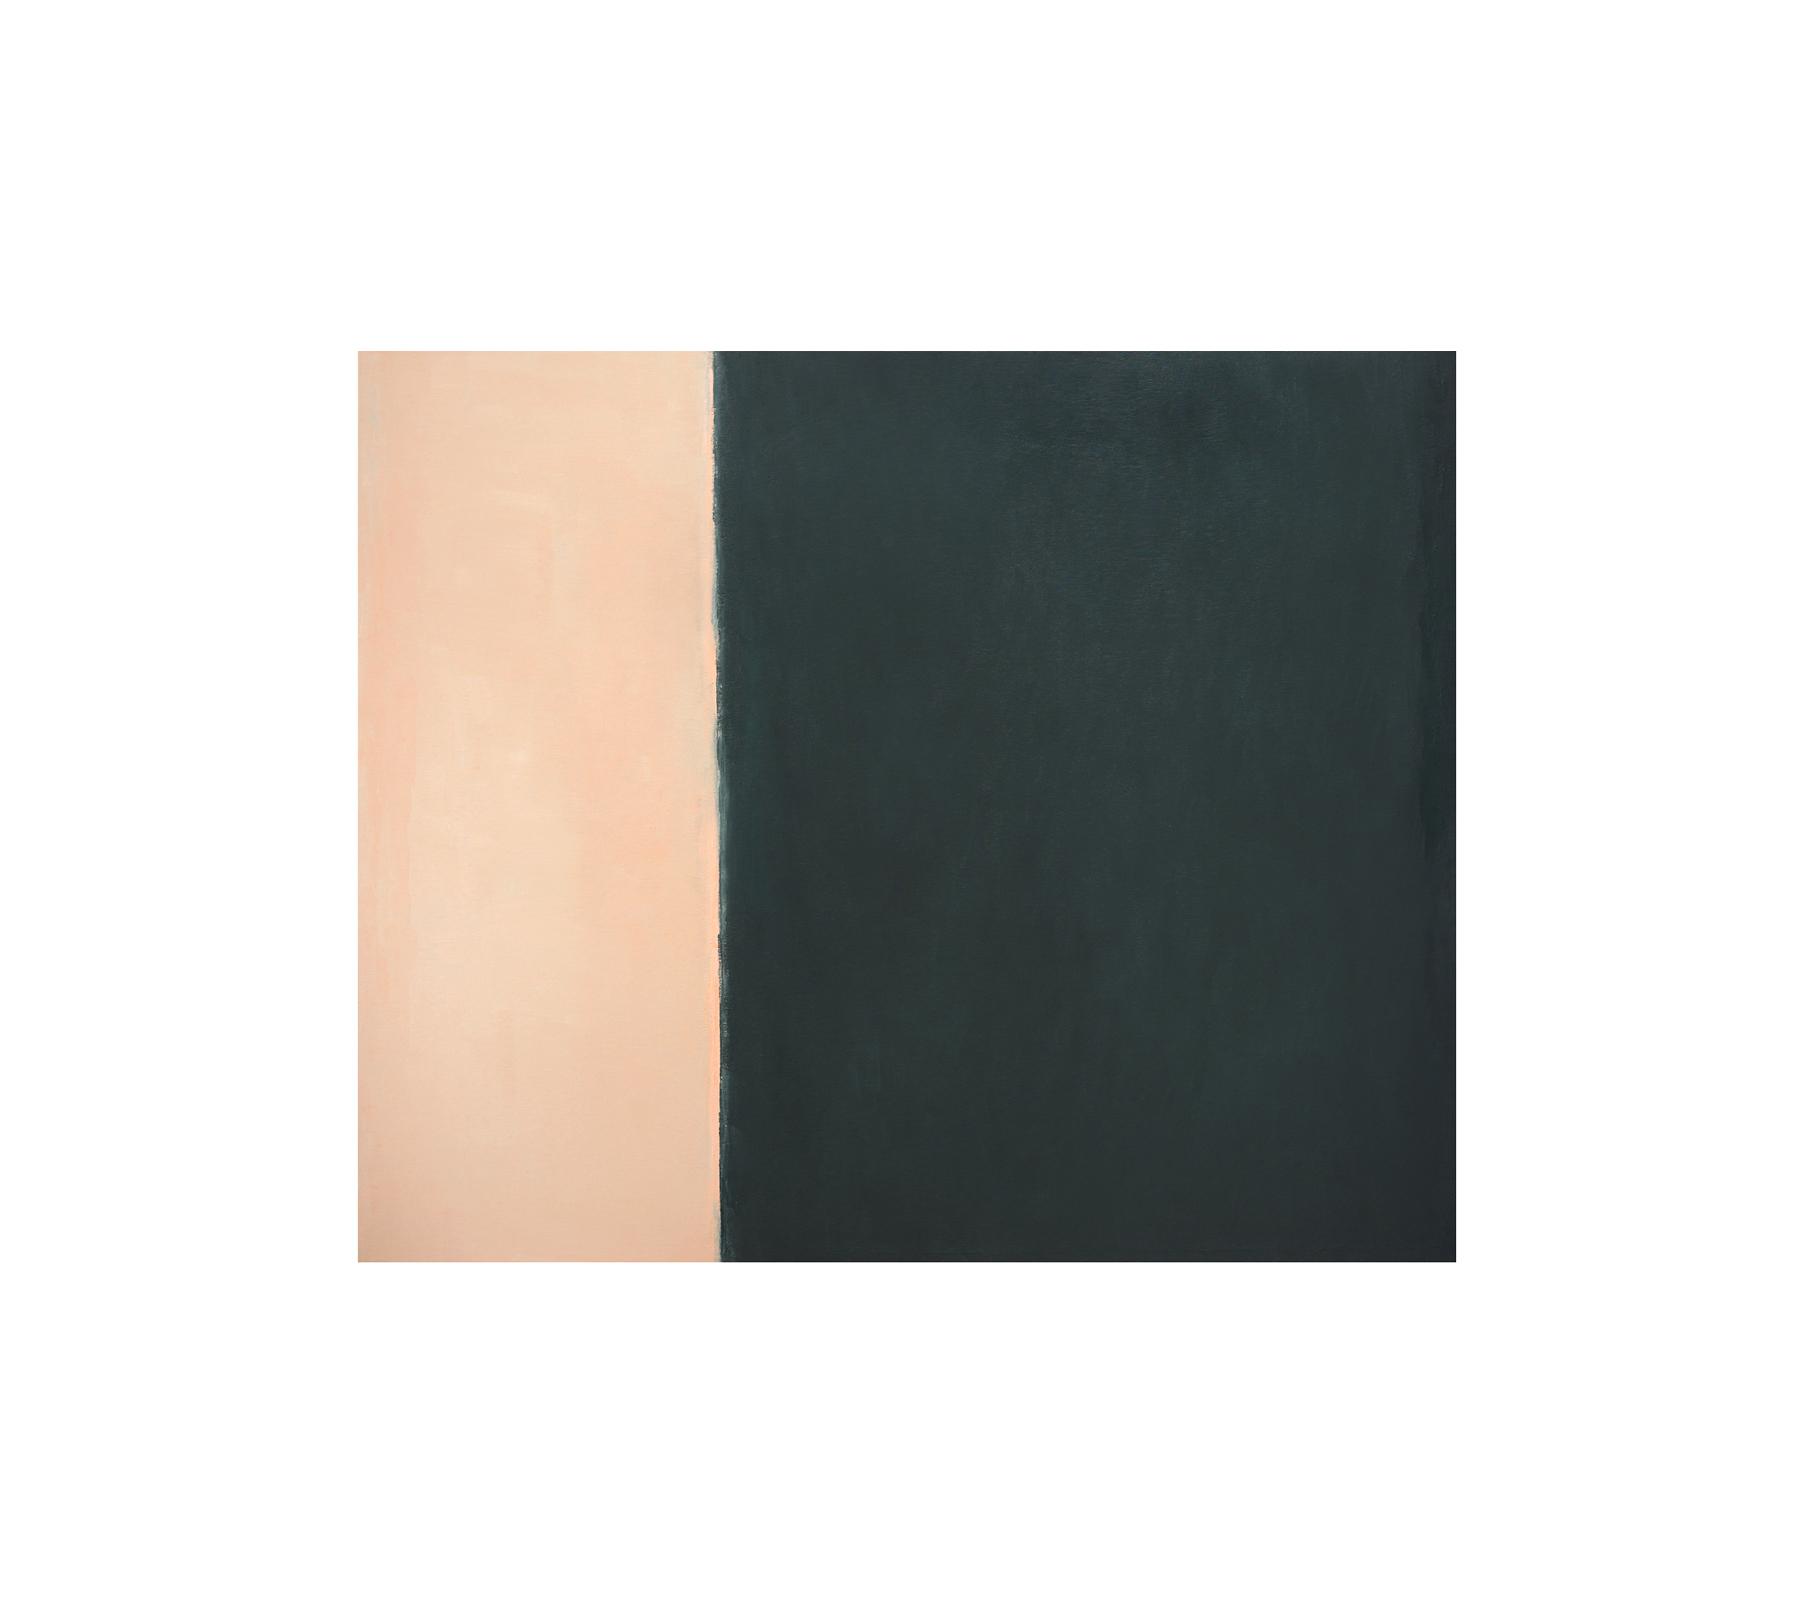 Untitled 2019 150x180cm